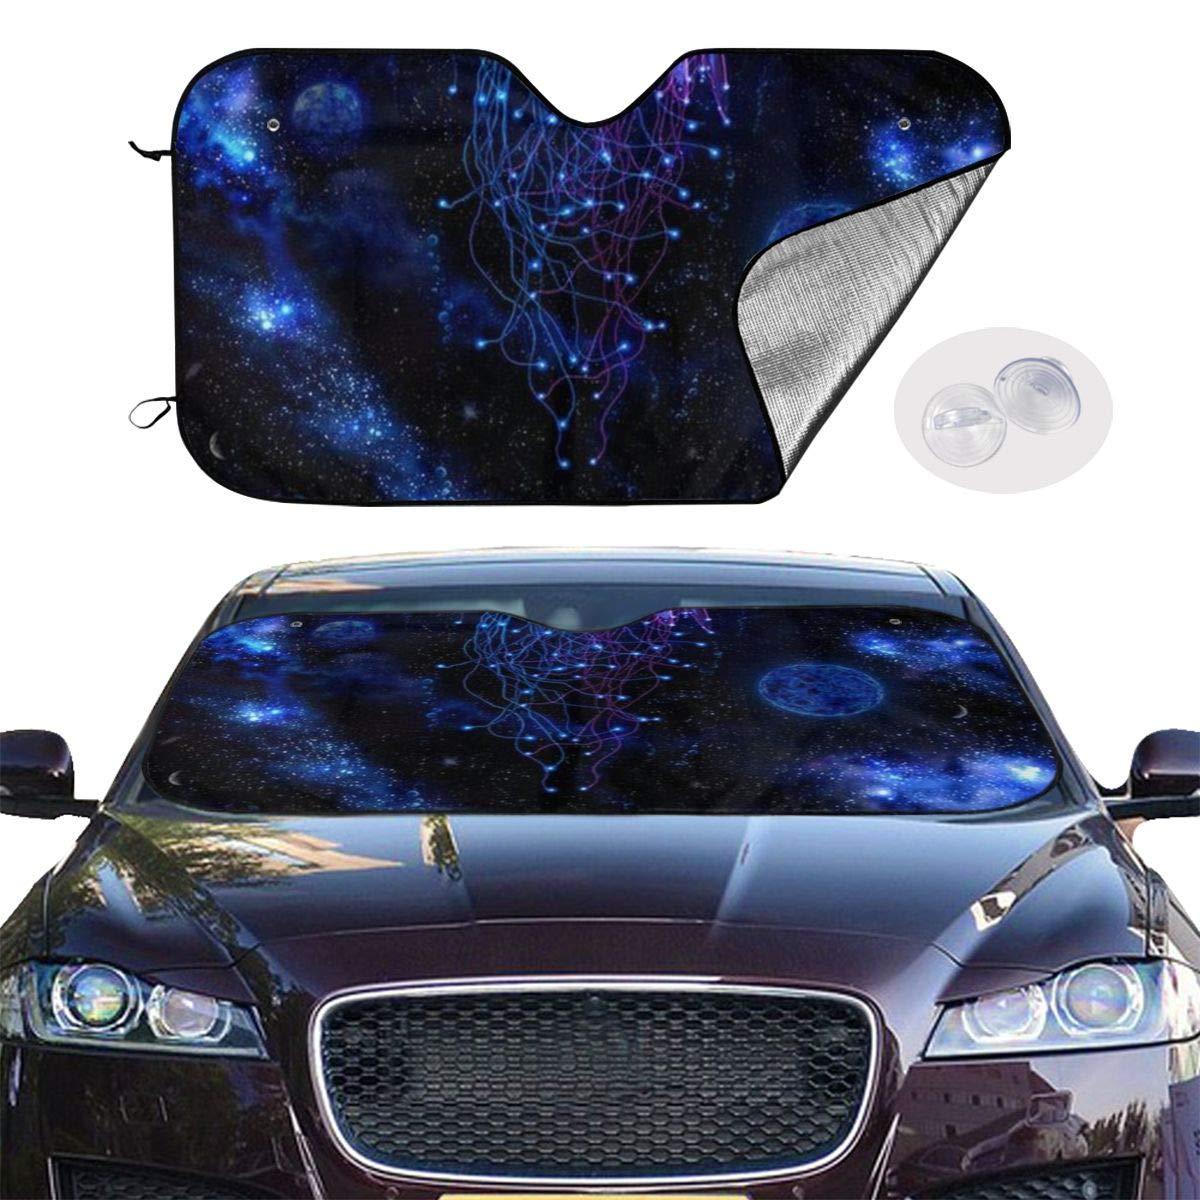 HE - Fashion Car Windshield Sun Shade - Blocks UV Rays Sun Visor Protector, Sunshade to Keep Your Vehicle Cool and Damage Free, Easy to Use - Cosmic Galaxy Under Sea Ocean Jellyfish by HE - Fashion